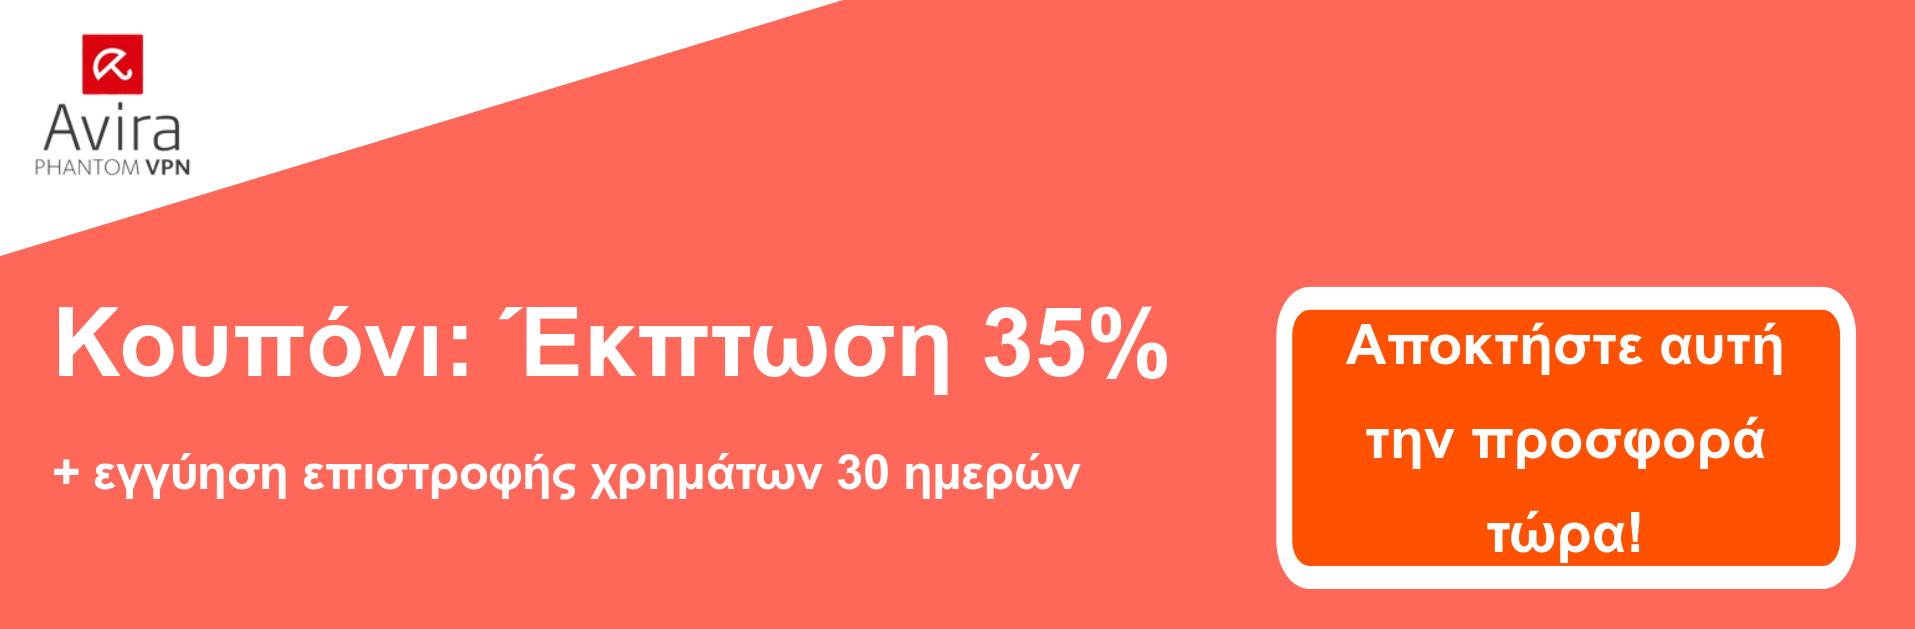 Banner κουπονιών AviraVPN - έκπτωση 35%